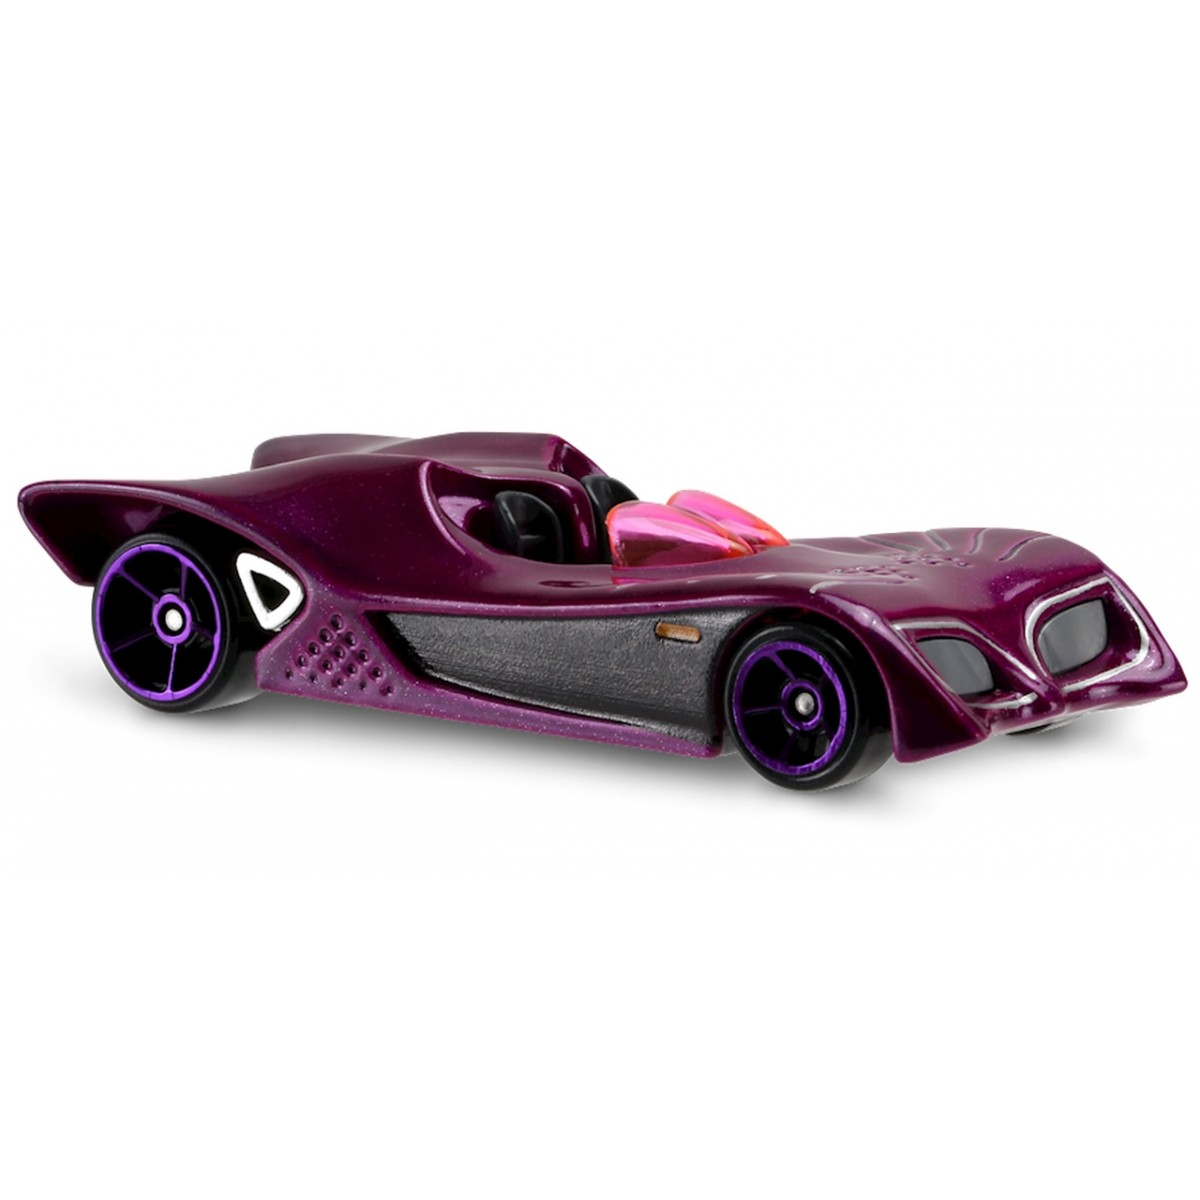 Carrinho Hot Wheels: Catwoman (Hawkman) Pink